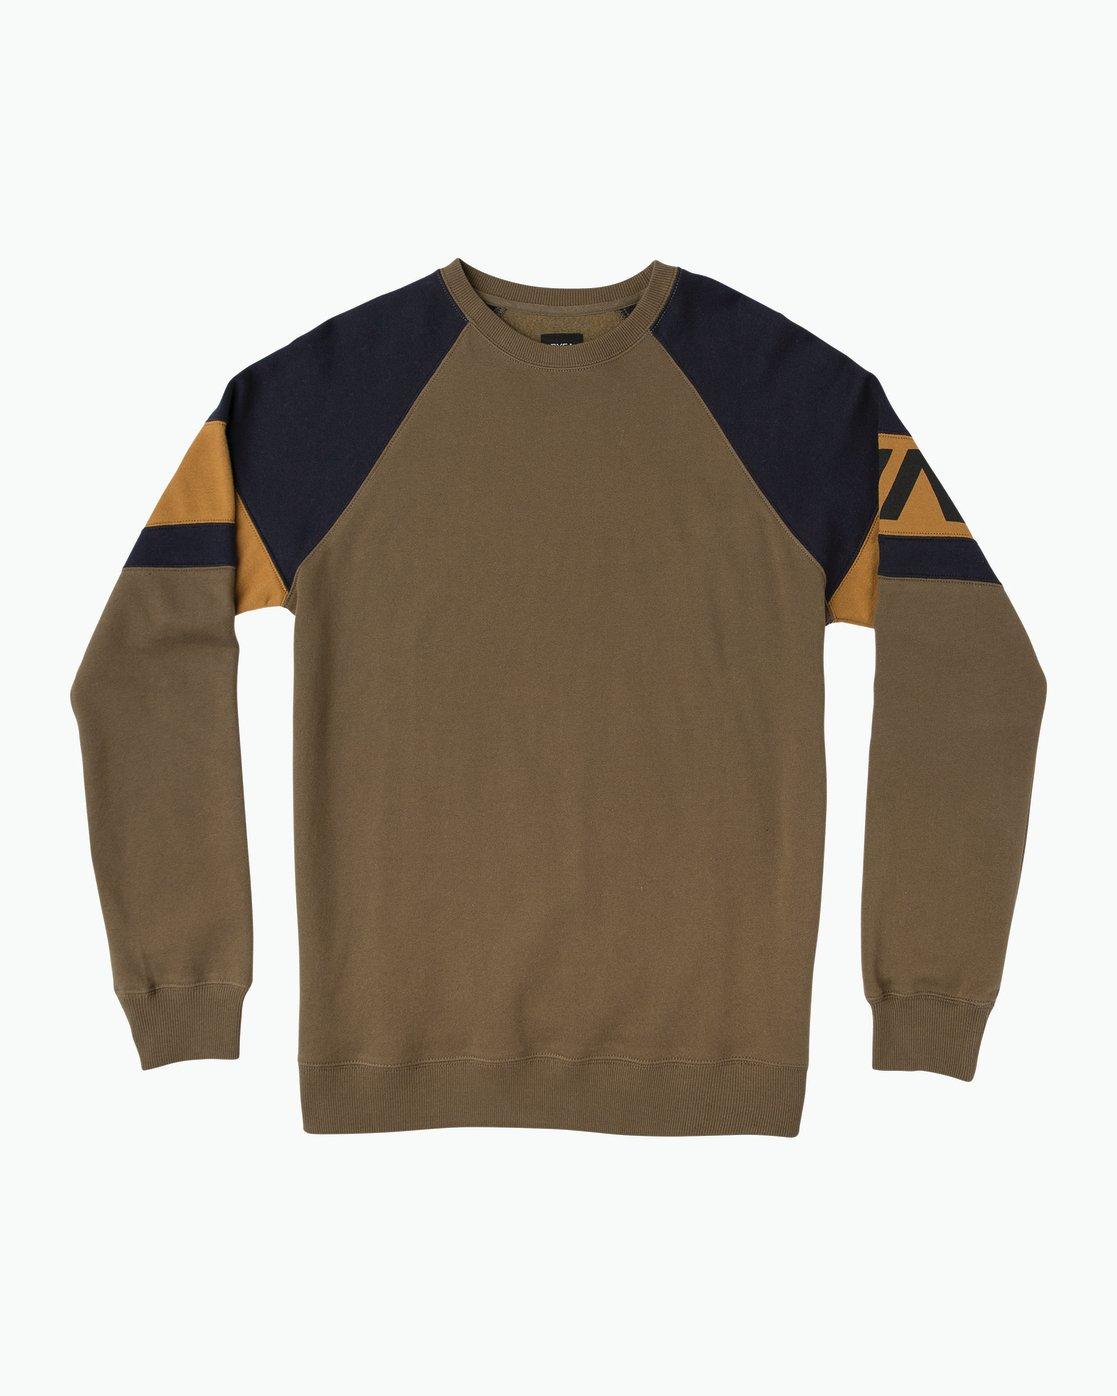 0 Benny Colorblocked Sweatshirt Green M640SRBC RVCA